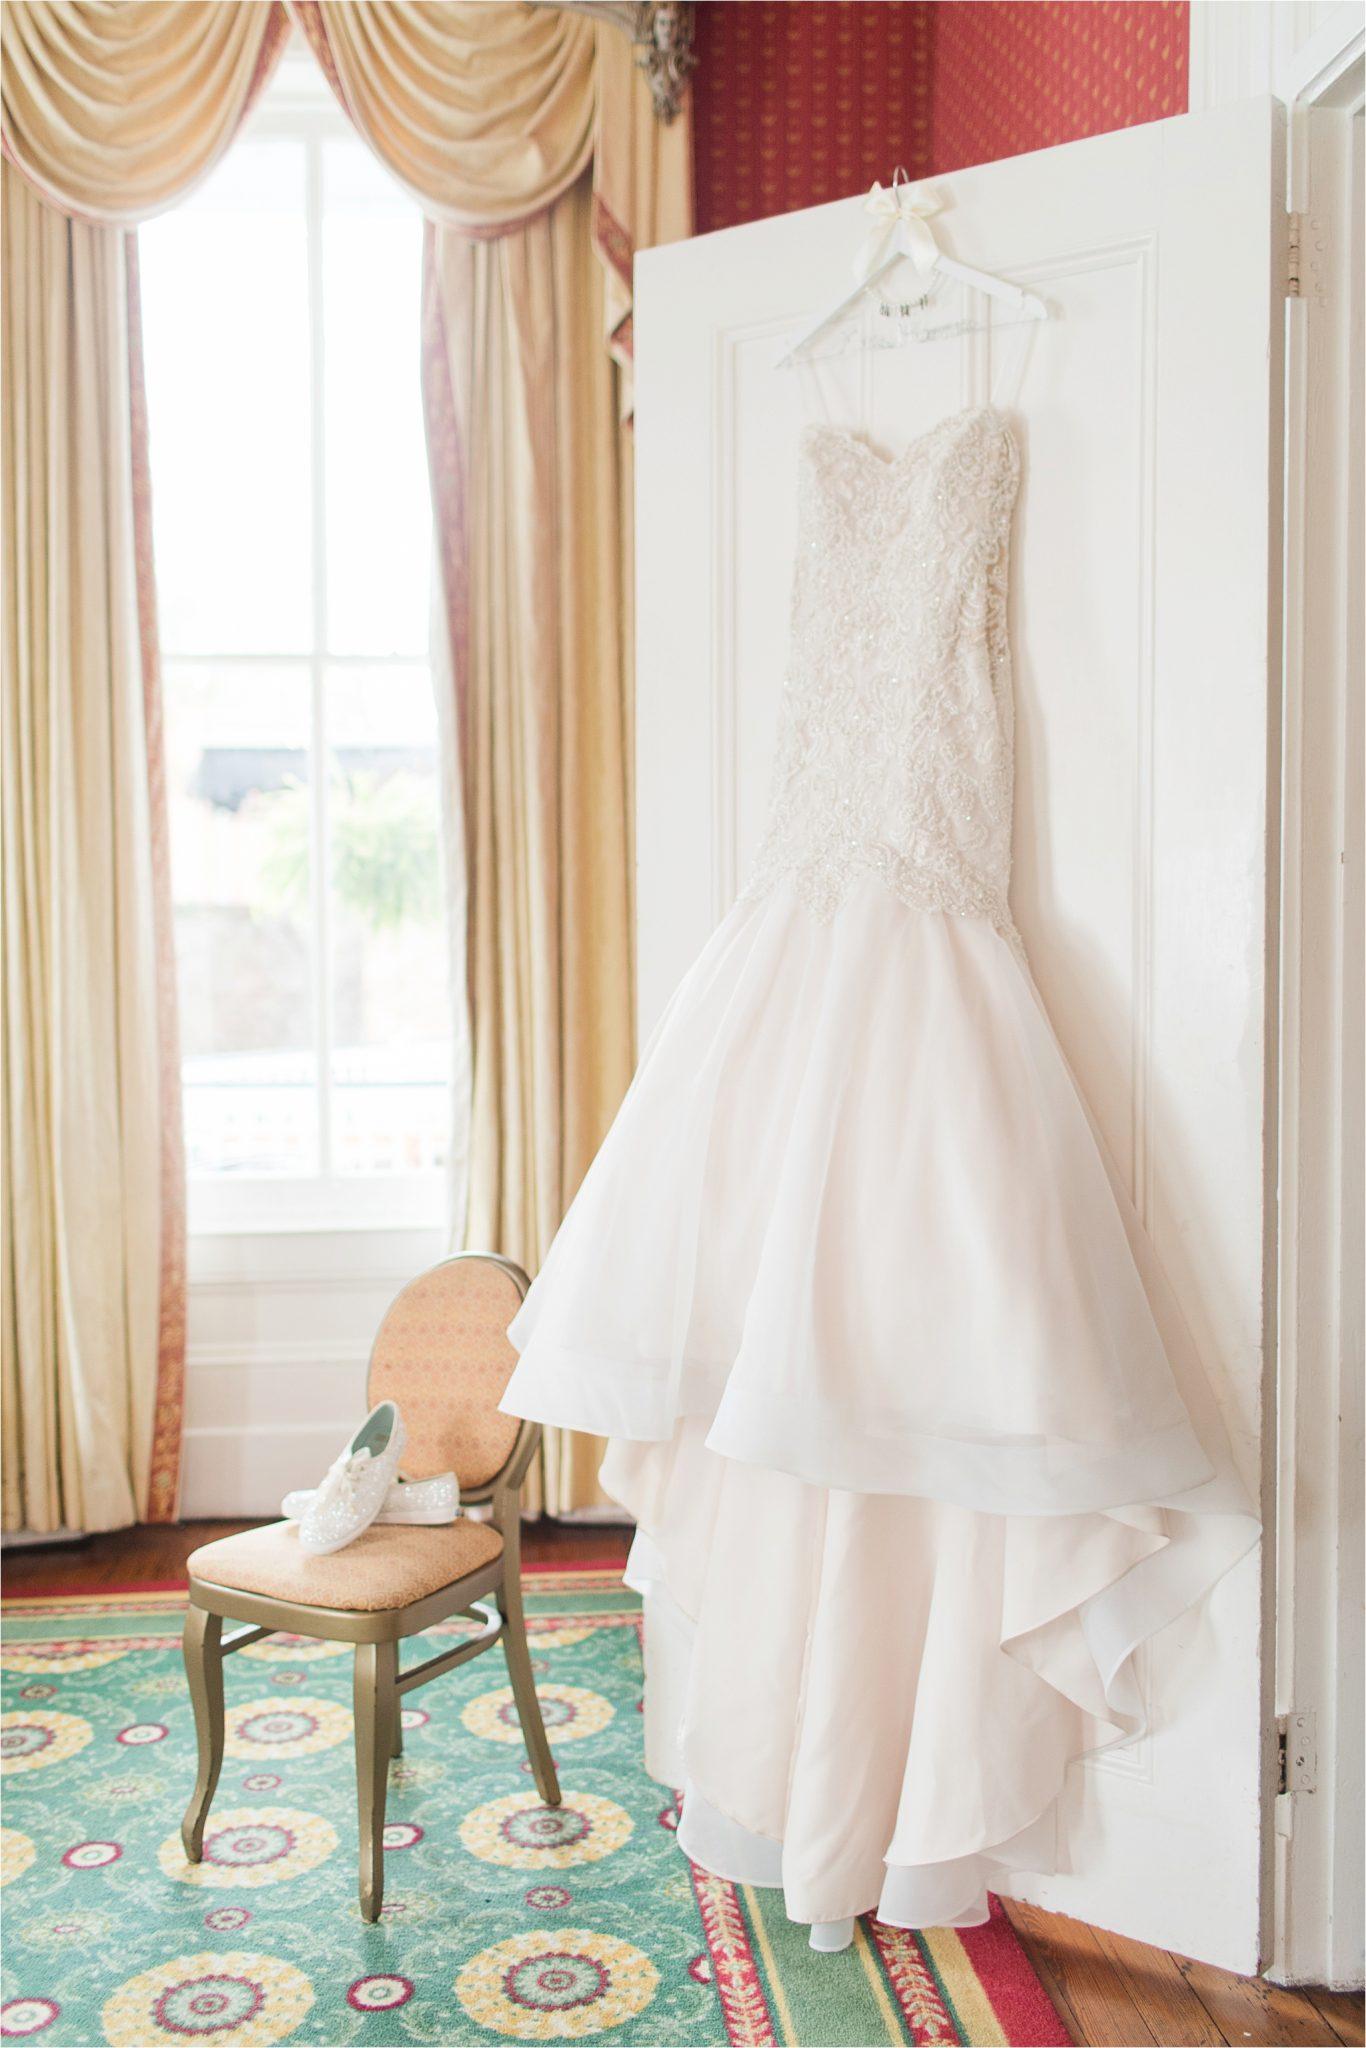 mermaid wedding dress-strapless-diamond studded-jeweled-layered wedding skirt